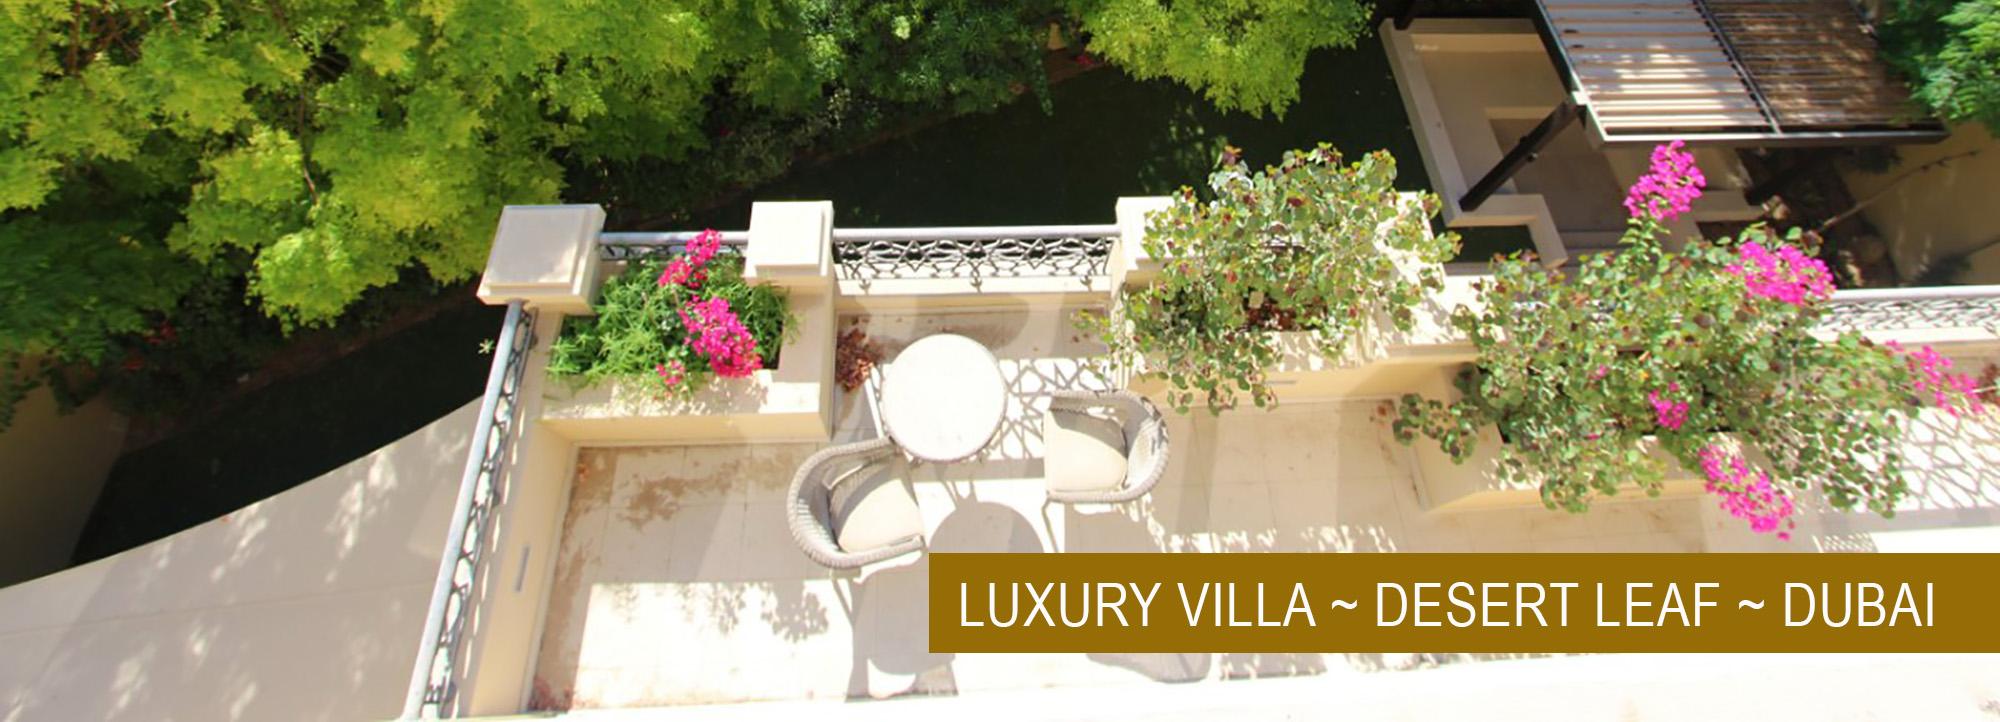 Luxury Villa Dubai – Al Barari Desert (Aprox £2,621,444)